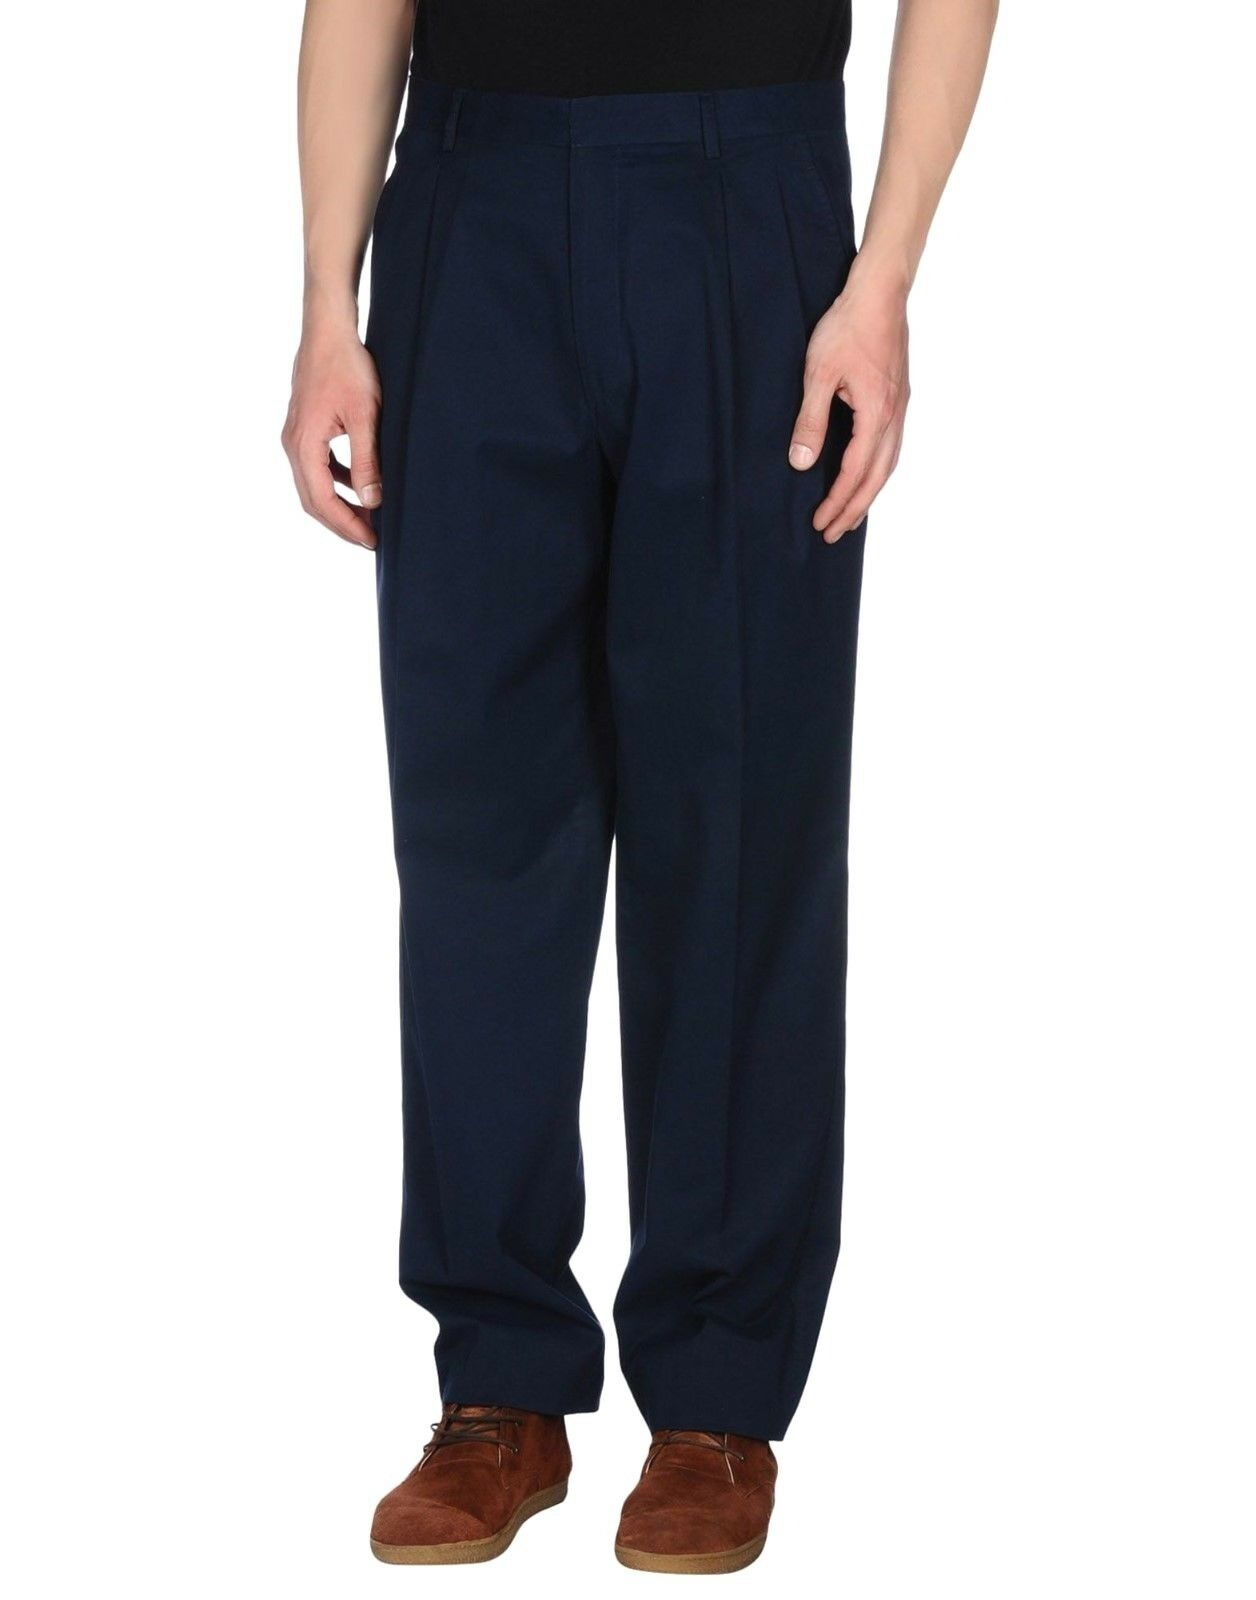 Iceberg Dark Navy bluee Casual Pants Trousers- W38 38L(Open Hem)